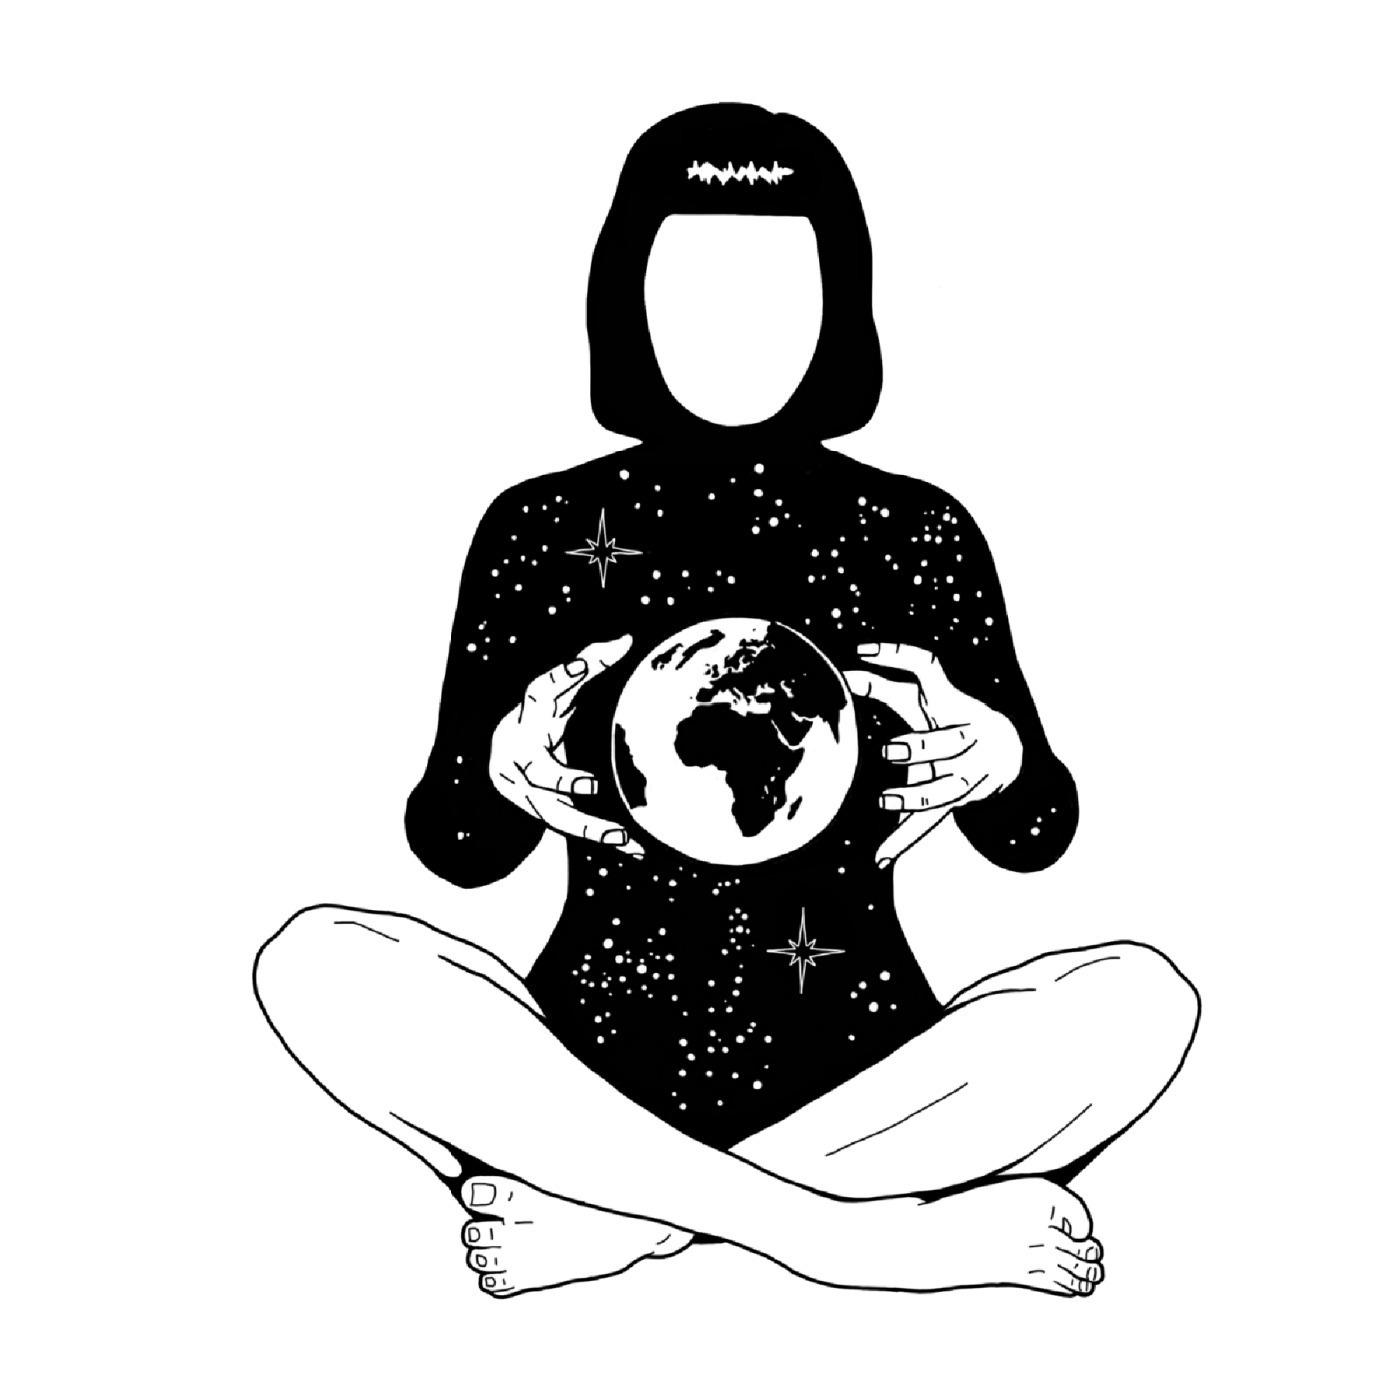 Melissa Ambrosini on Comparisonitis, Influencer Culture, and Radical Self-Love